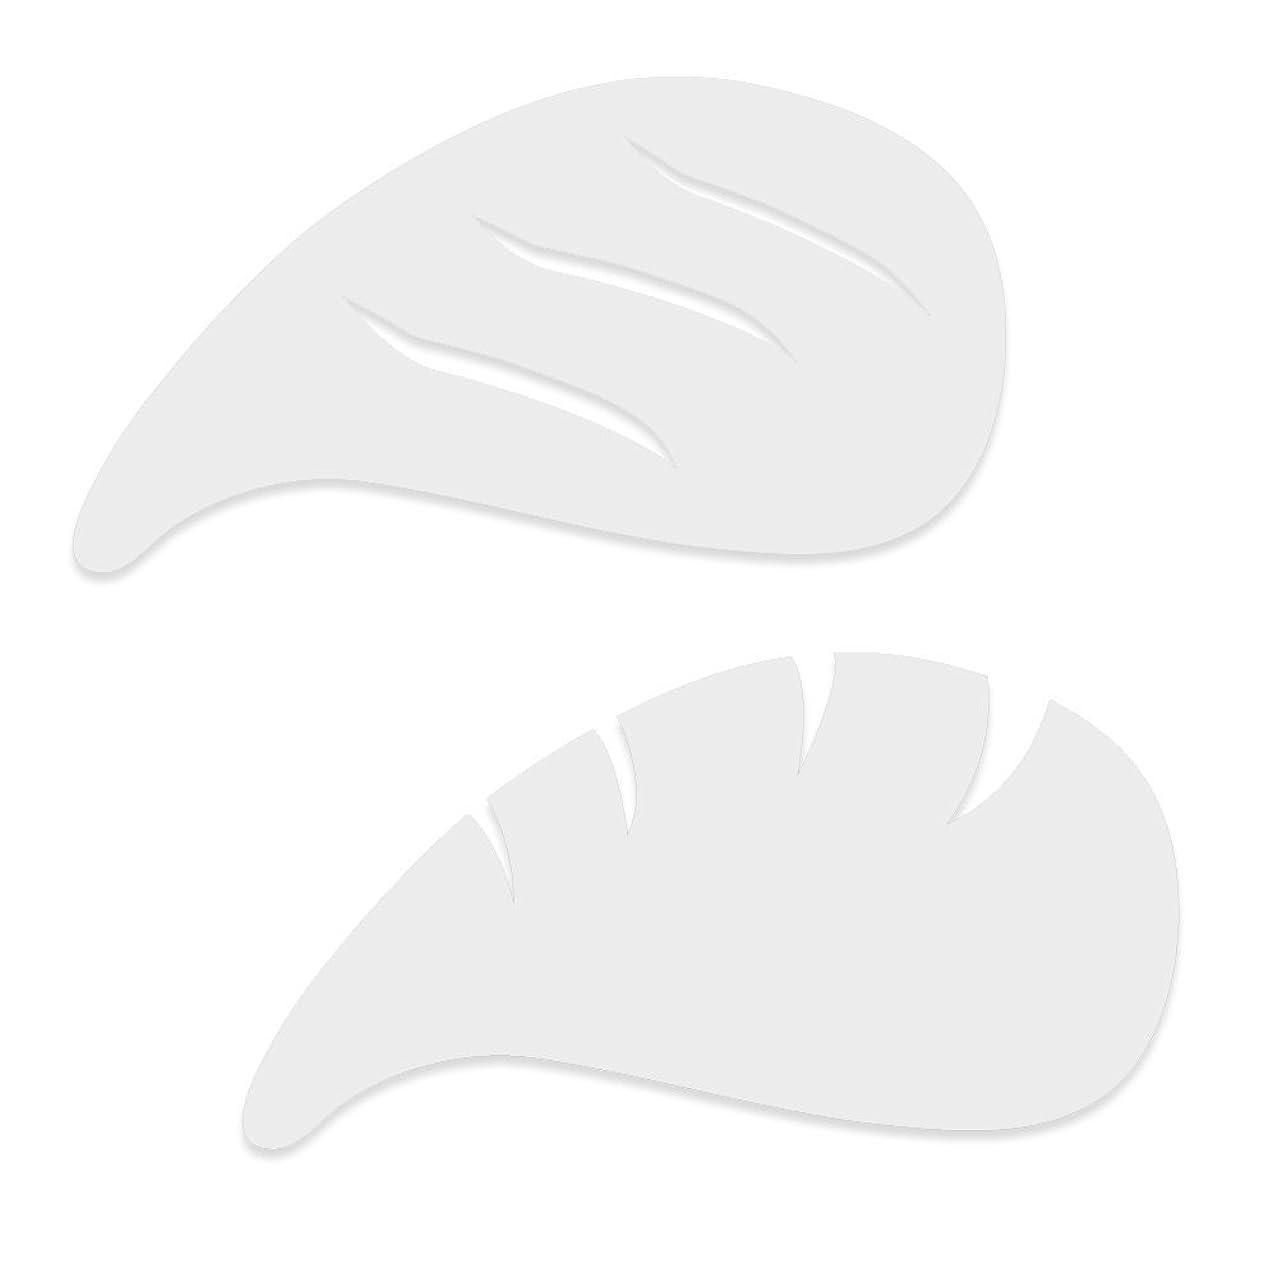 Dinair Airbrushing Professional Eyeliner, Eyebrow, Cateye Stencil